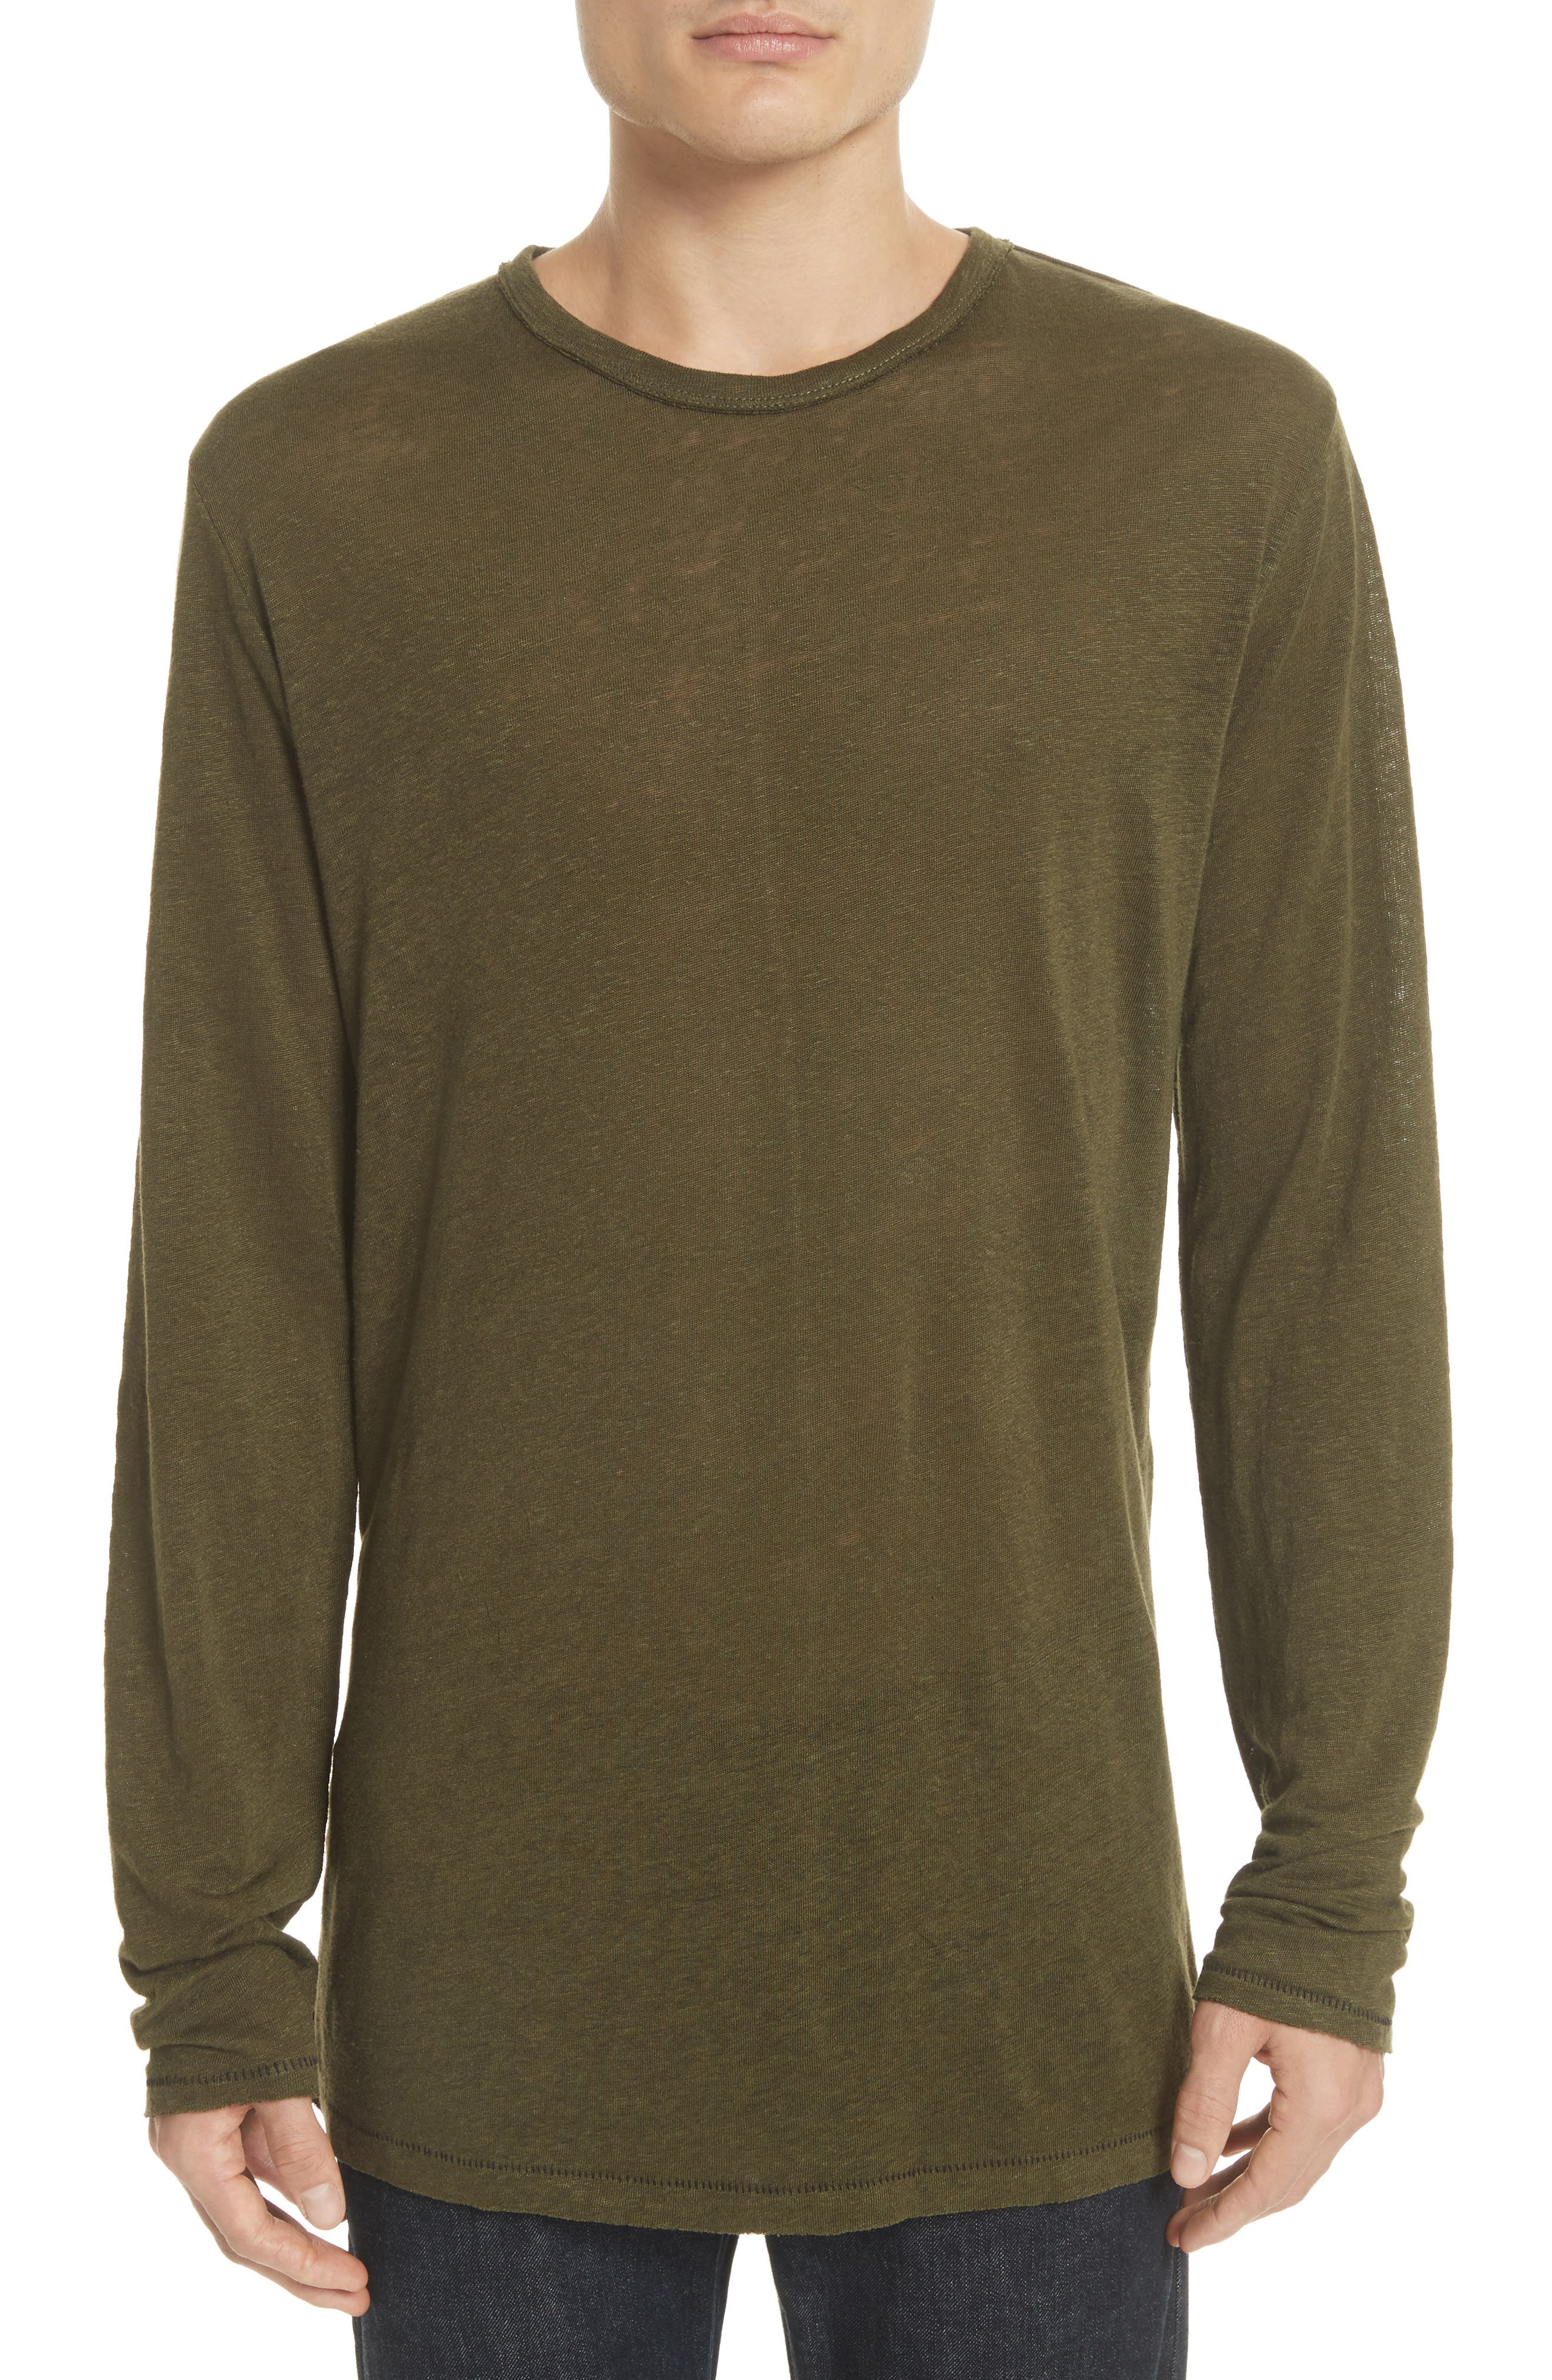 Owen Long Sleeve T-Shirt,                         Main,                         color, Army